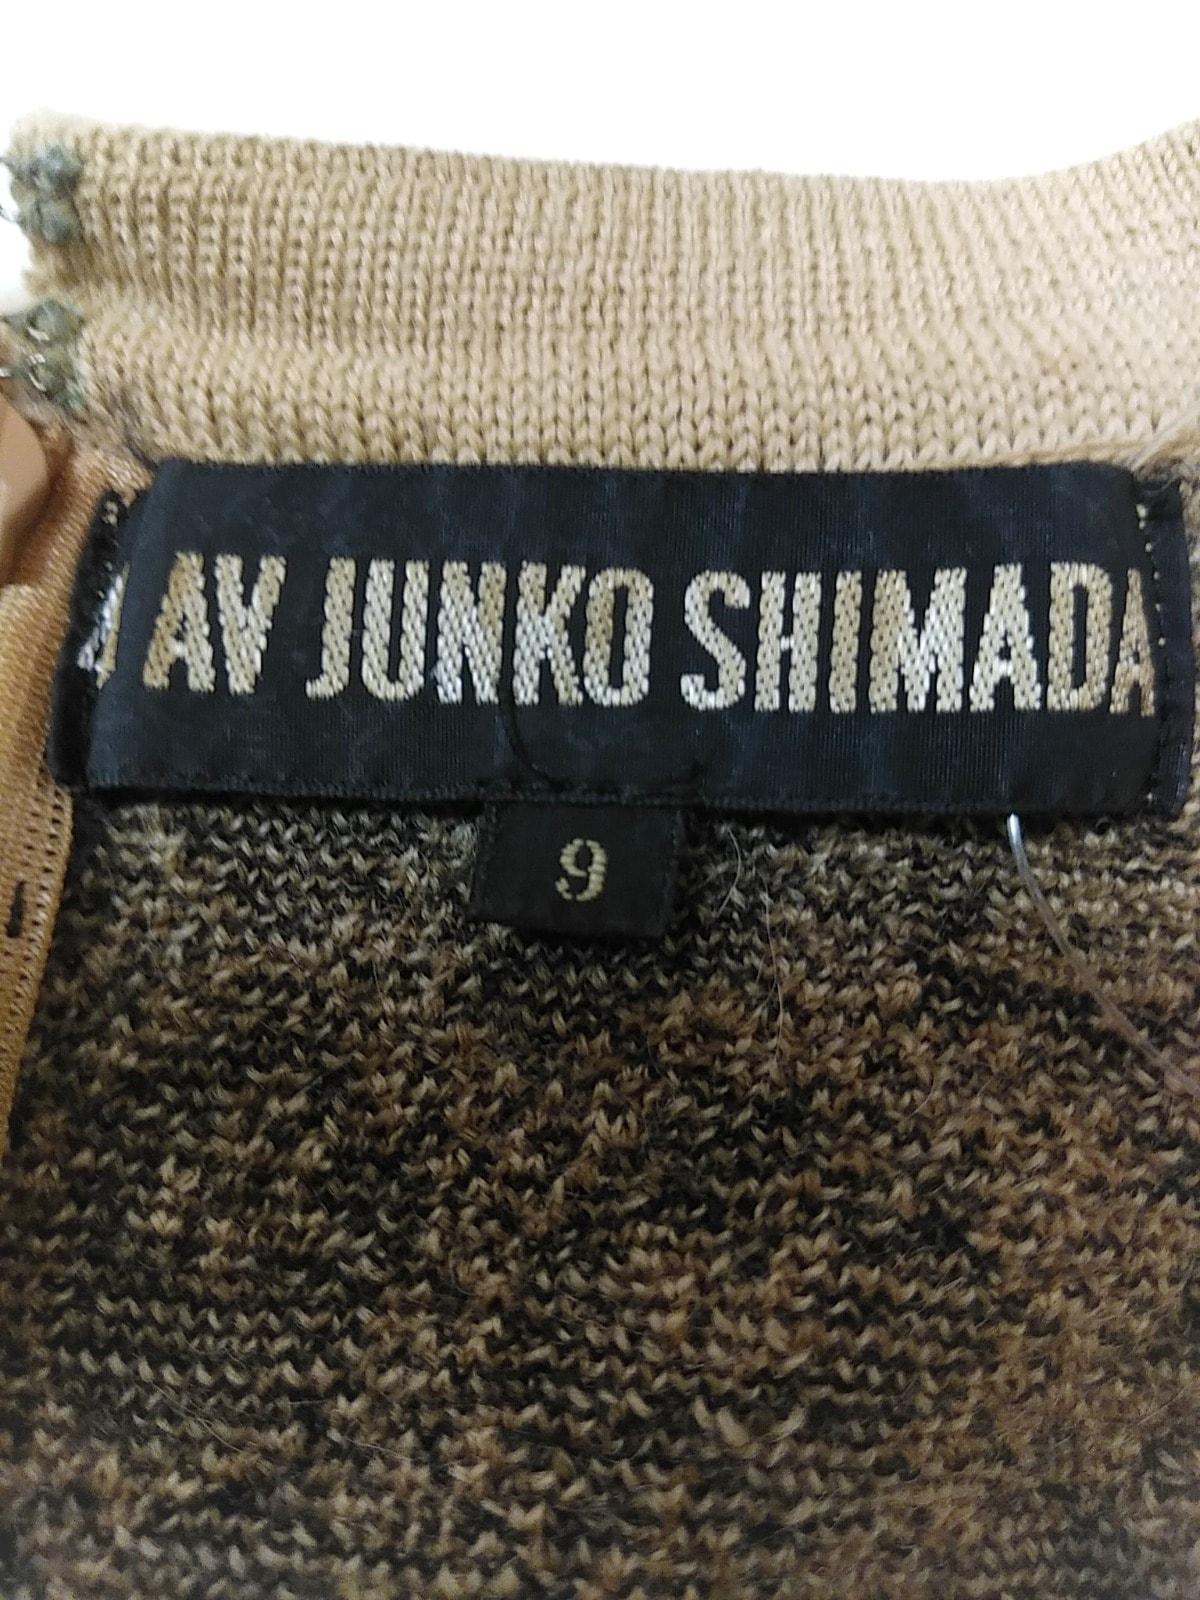 49av.Junko Shimada(49アベニュージュンコシマダ)のワンピース